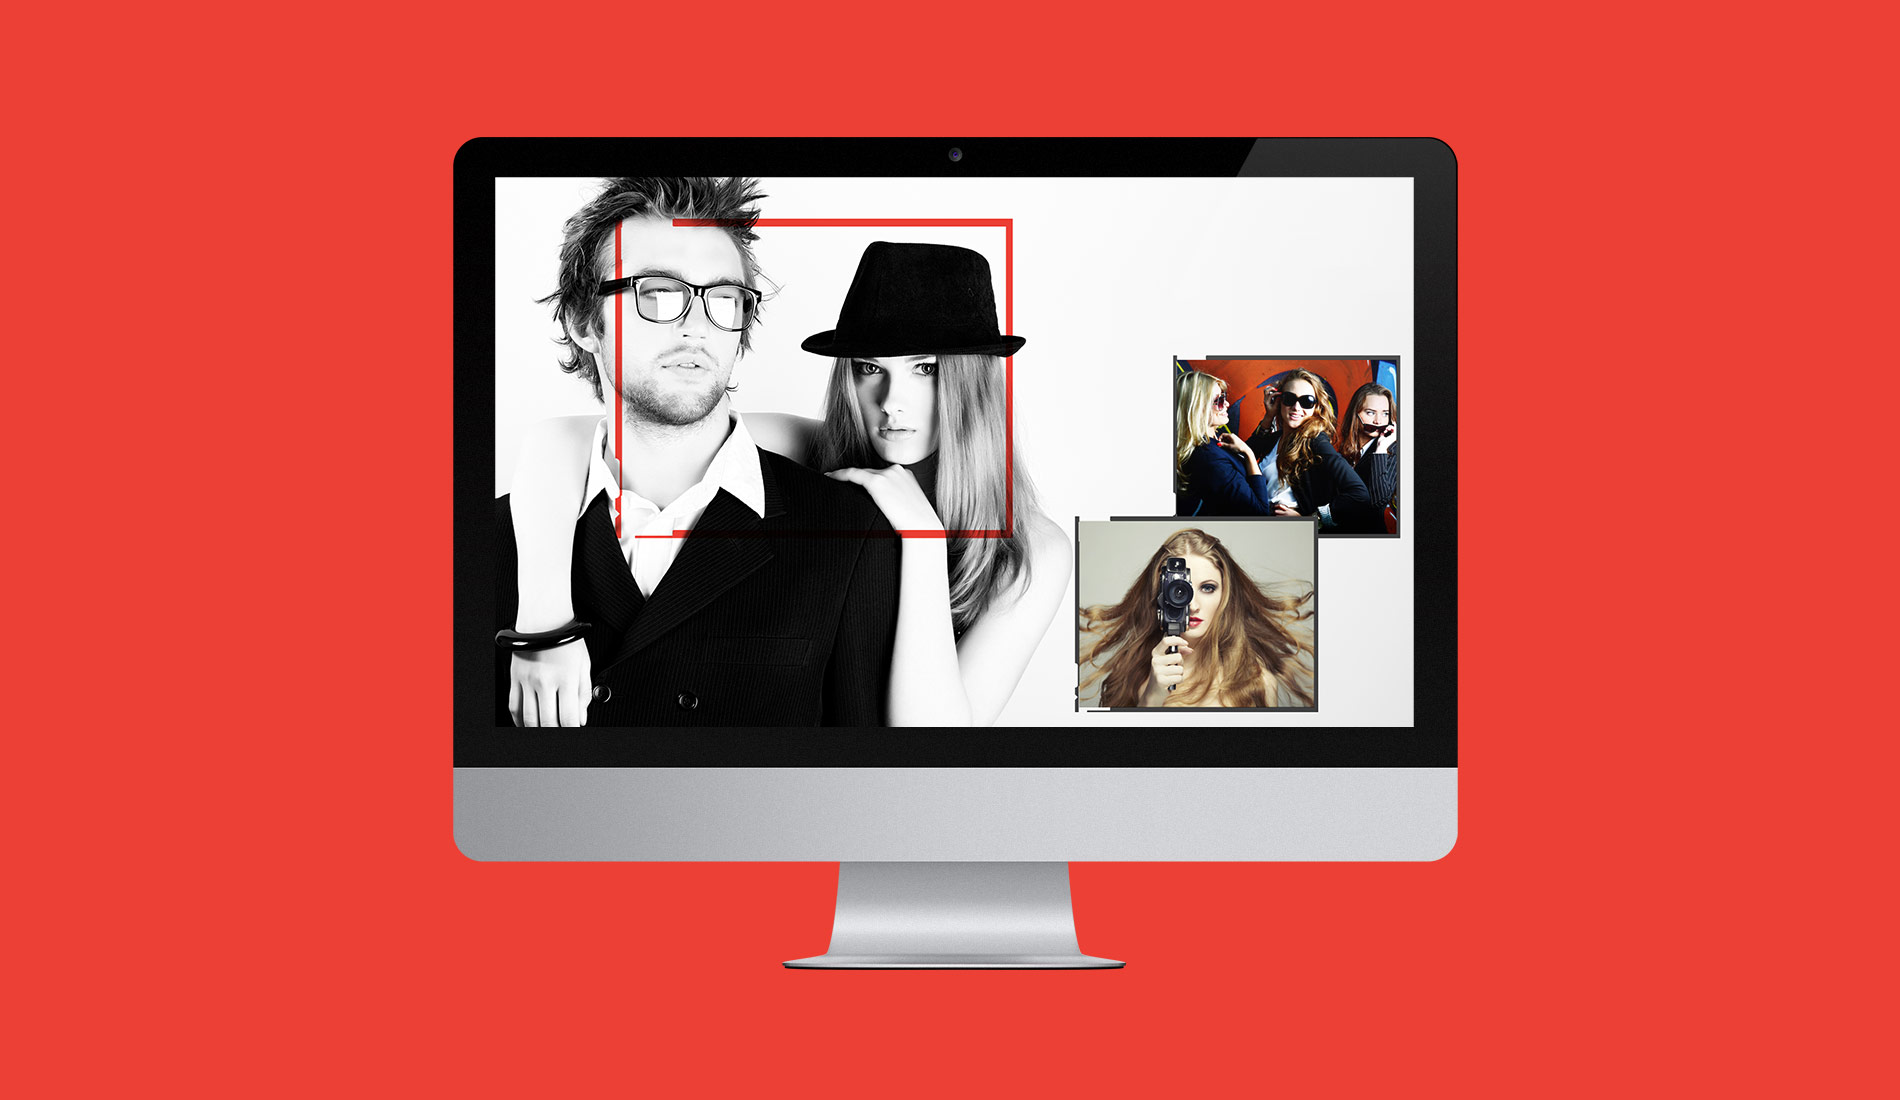 Responsive web design for a website designed for art students